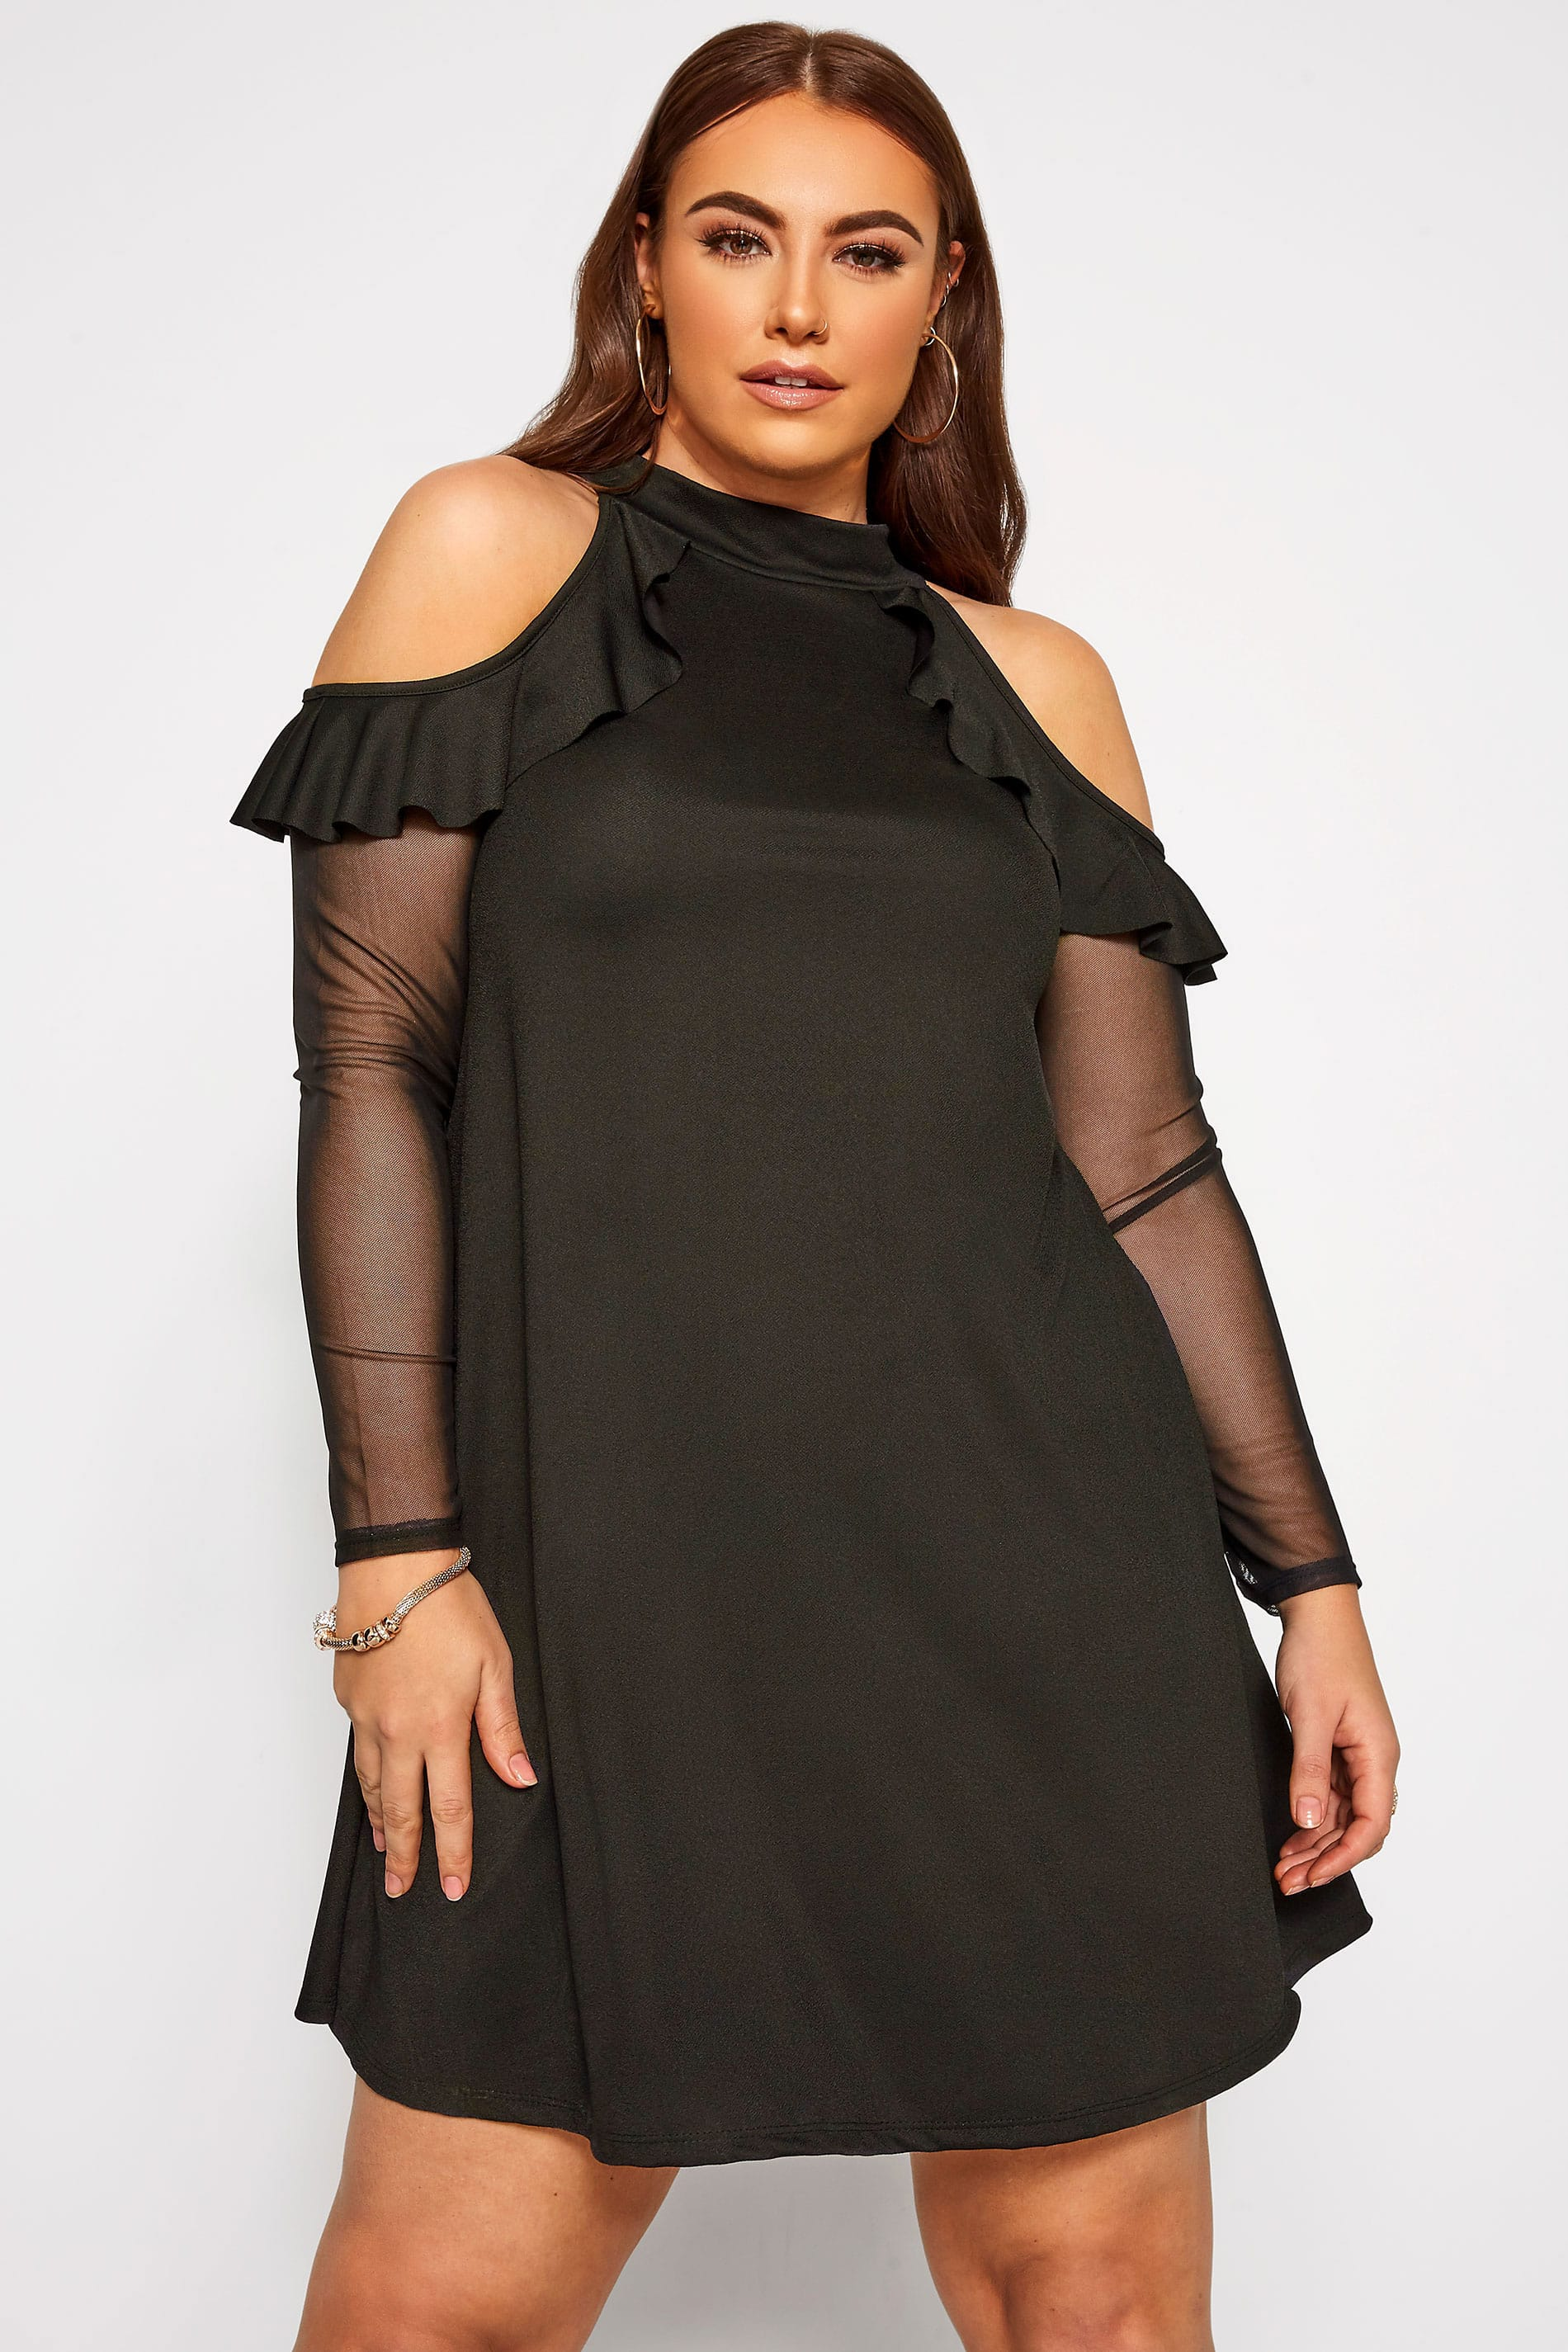 LIMITED COLLECTION Black Crepe Cold Shoulder Mesh Sleeve Frill Dress